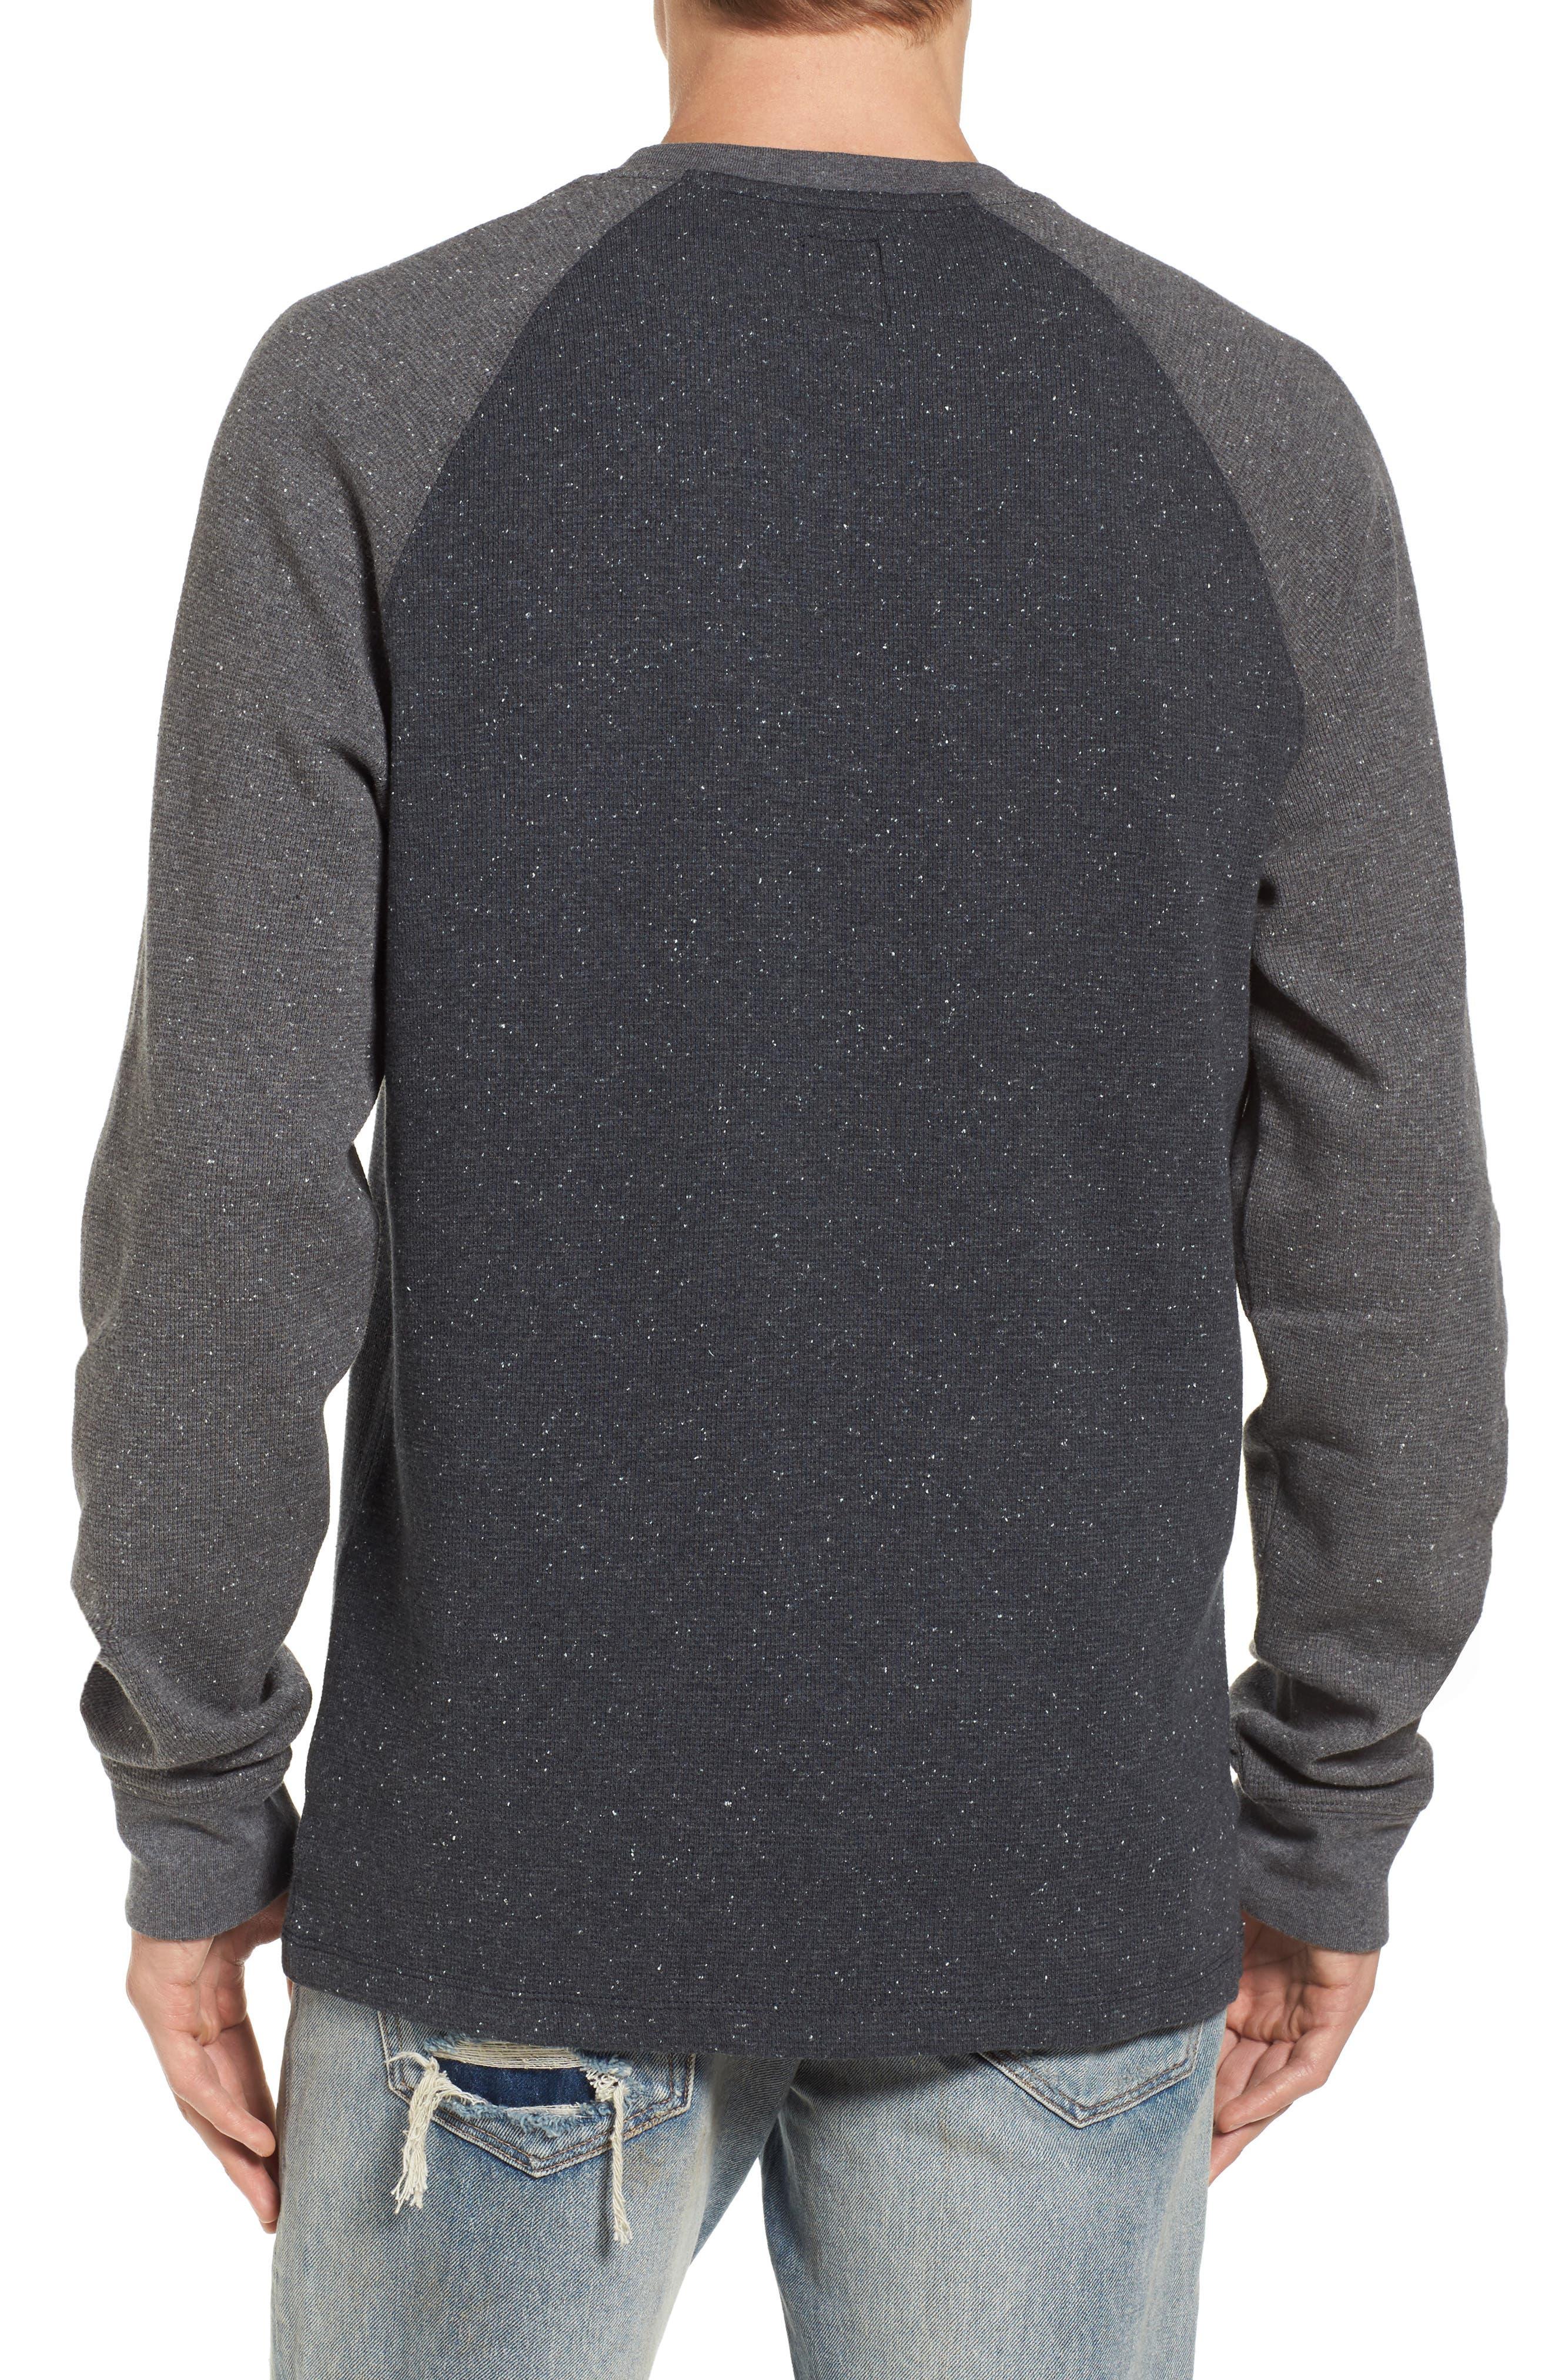 Burdett Thermal T-Shirt,                             Alternate thumbnail 2, color,                             001